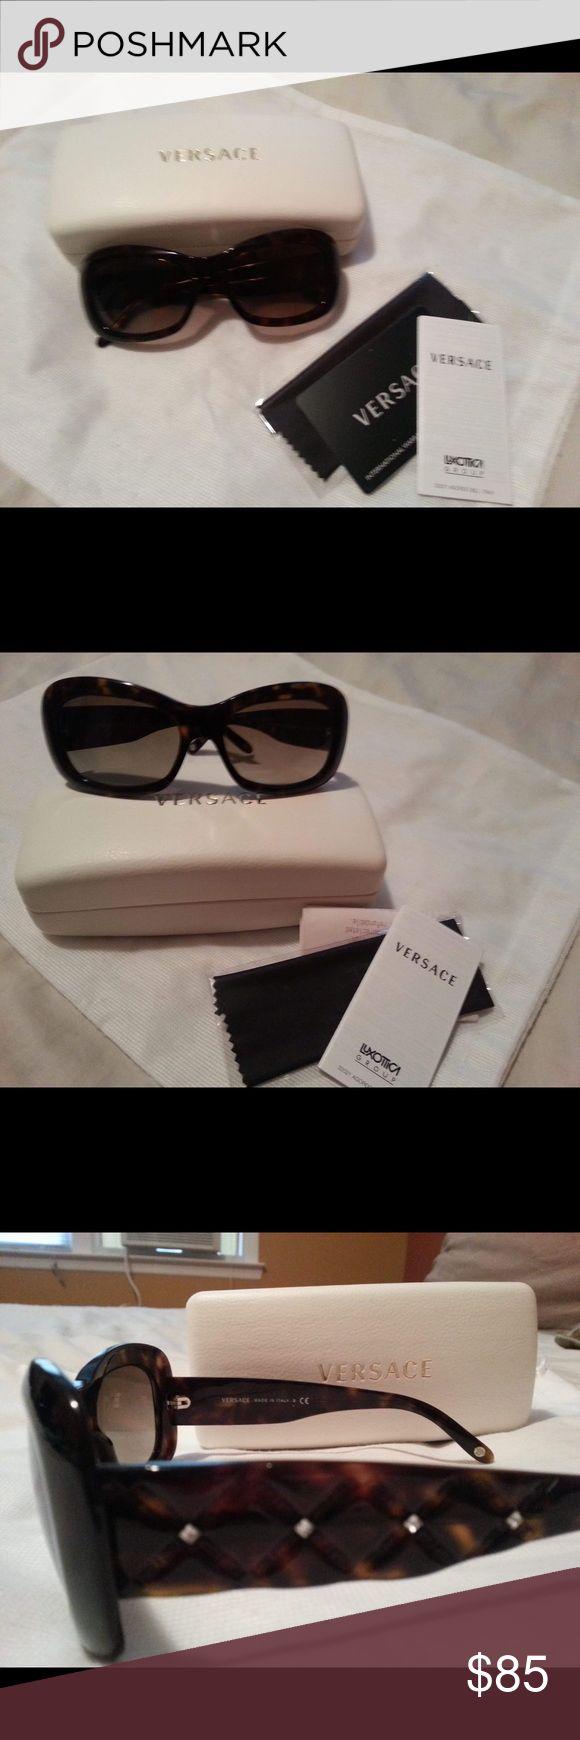 Versace Brand New Versace Sun Glasses in Brown Versace Accessories Glasses